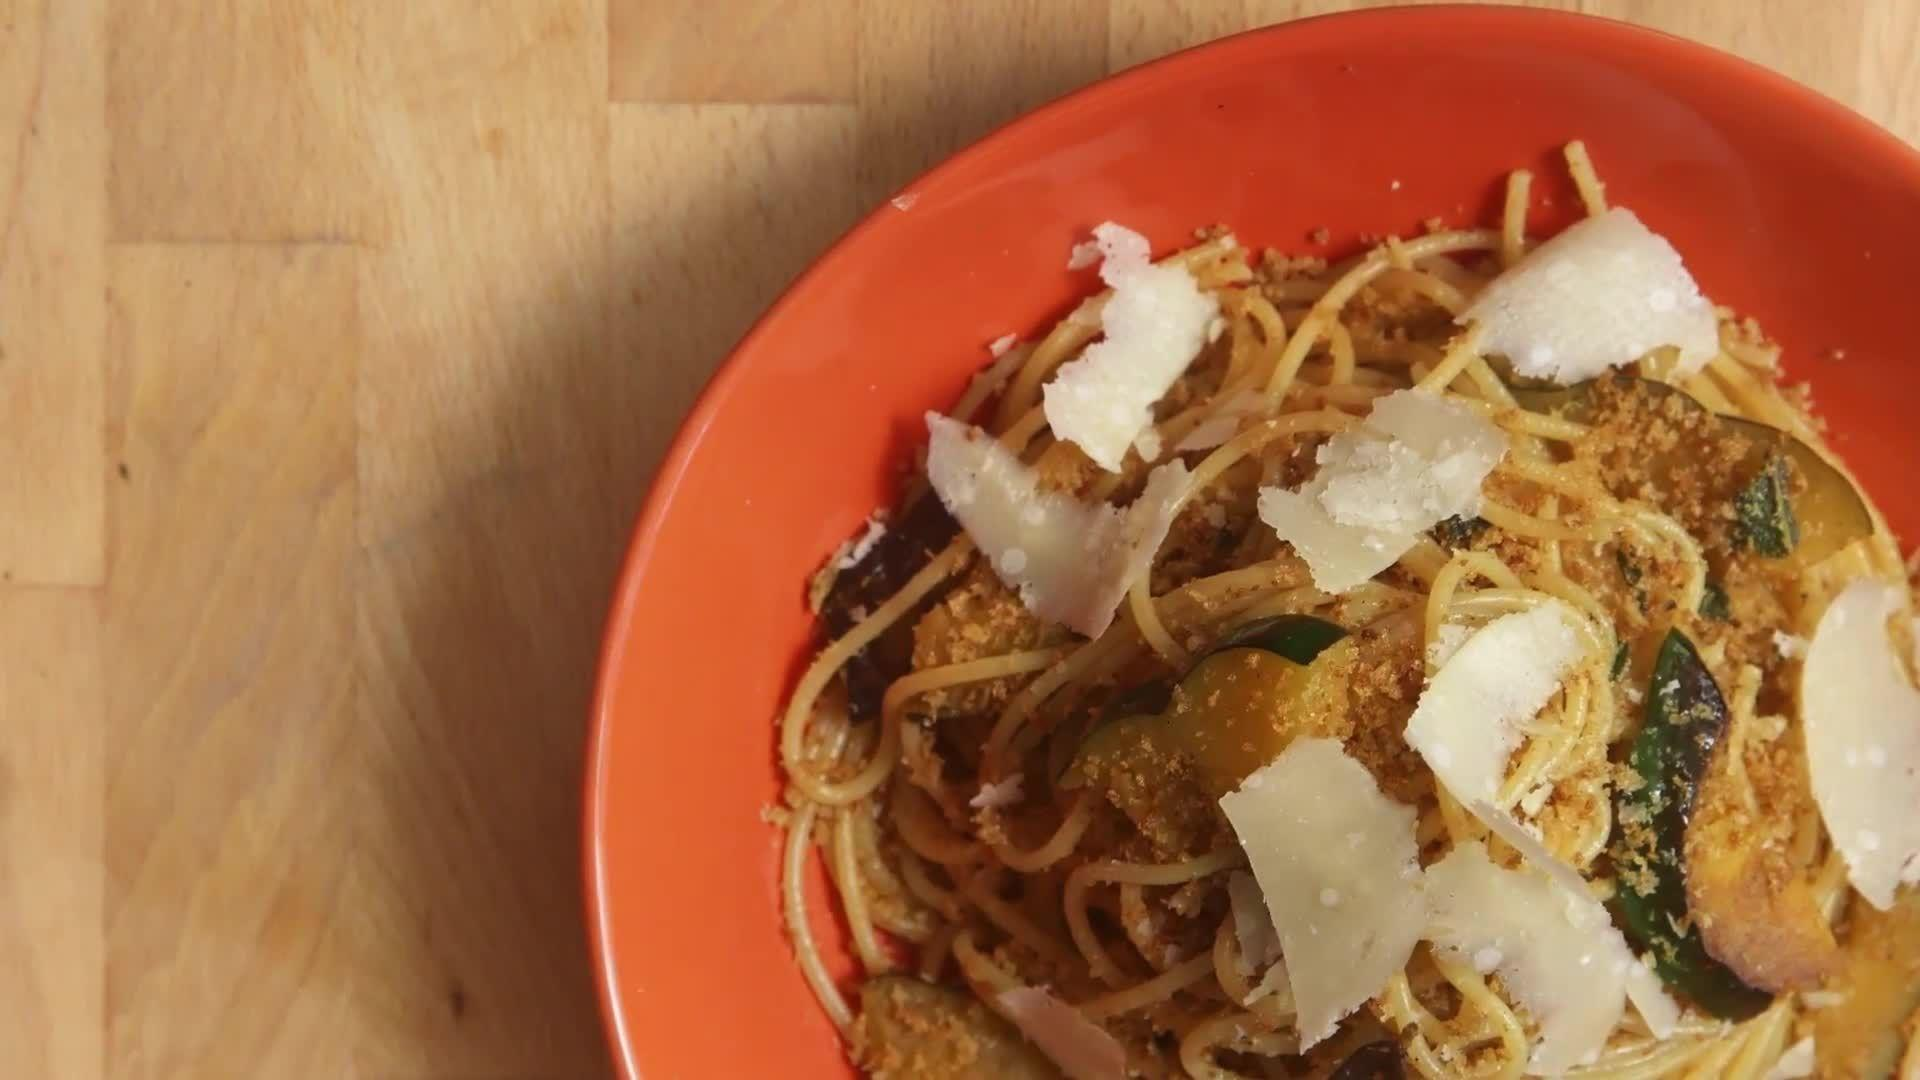 How to Make Easy Squash Pasta